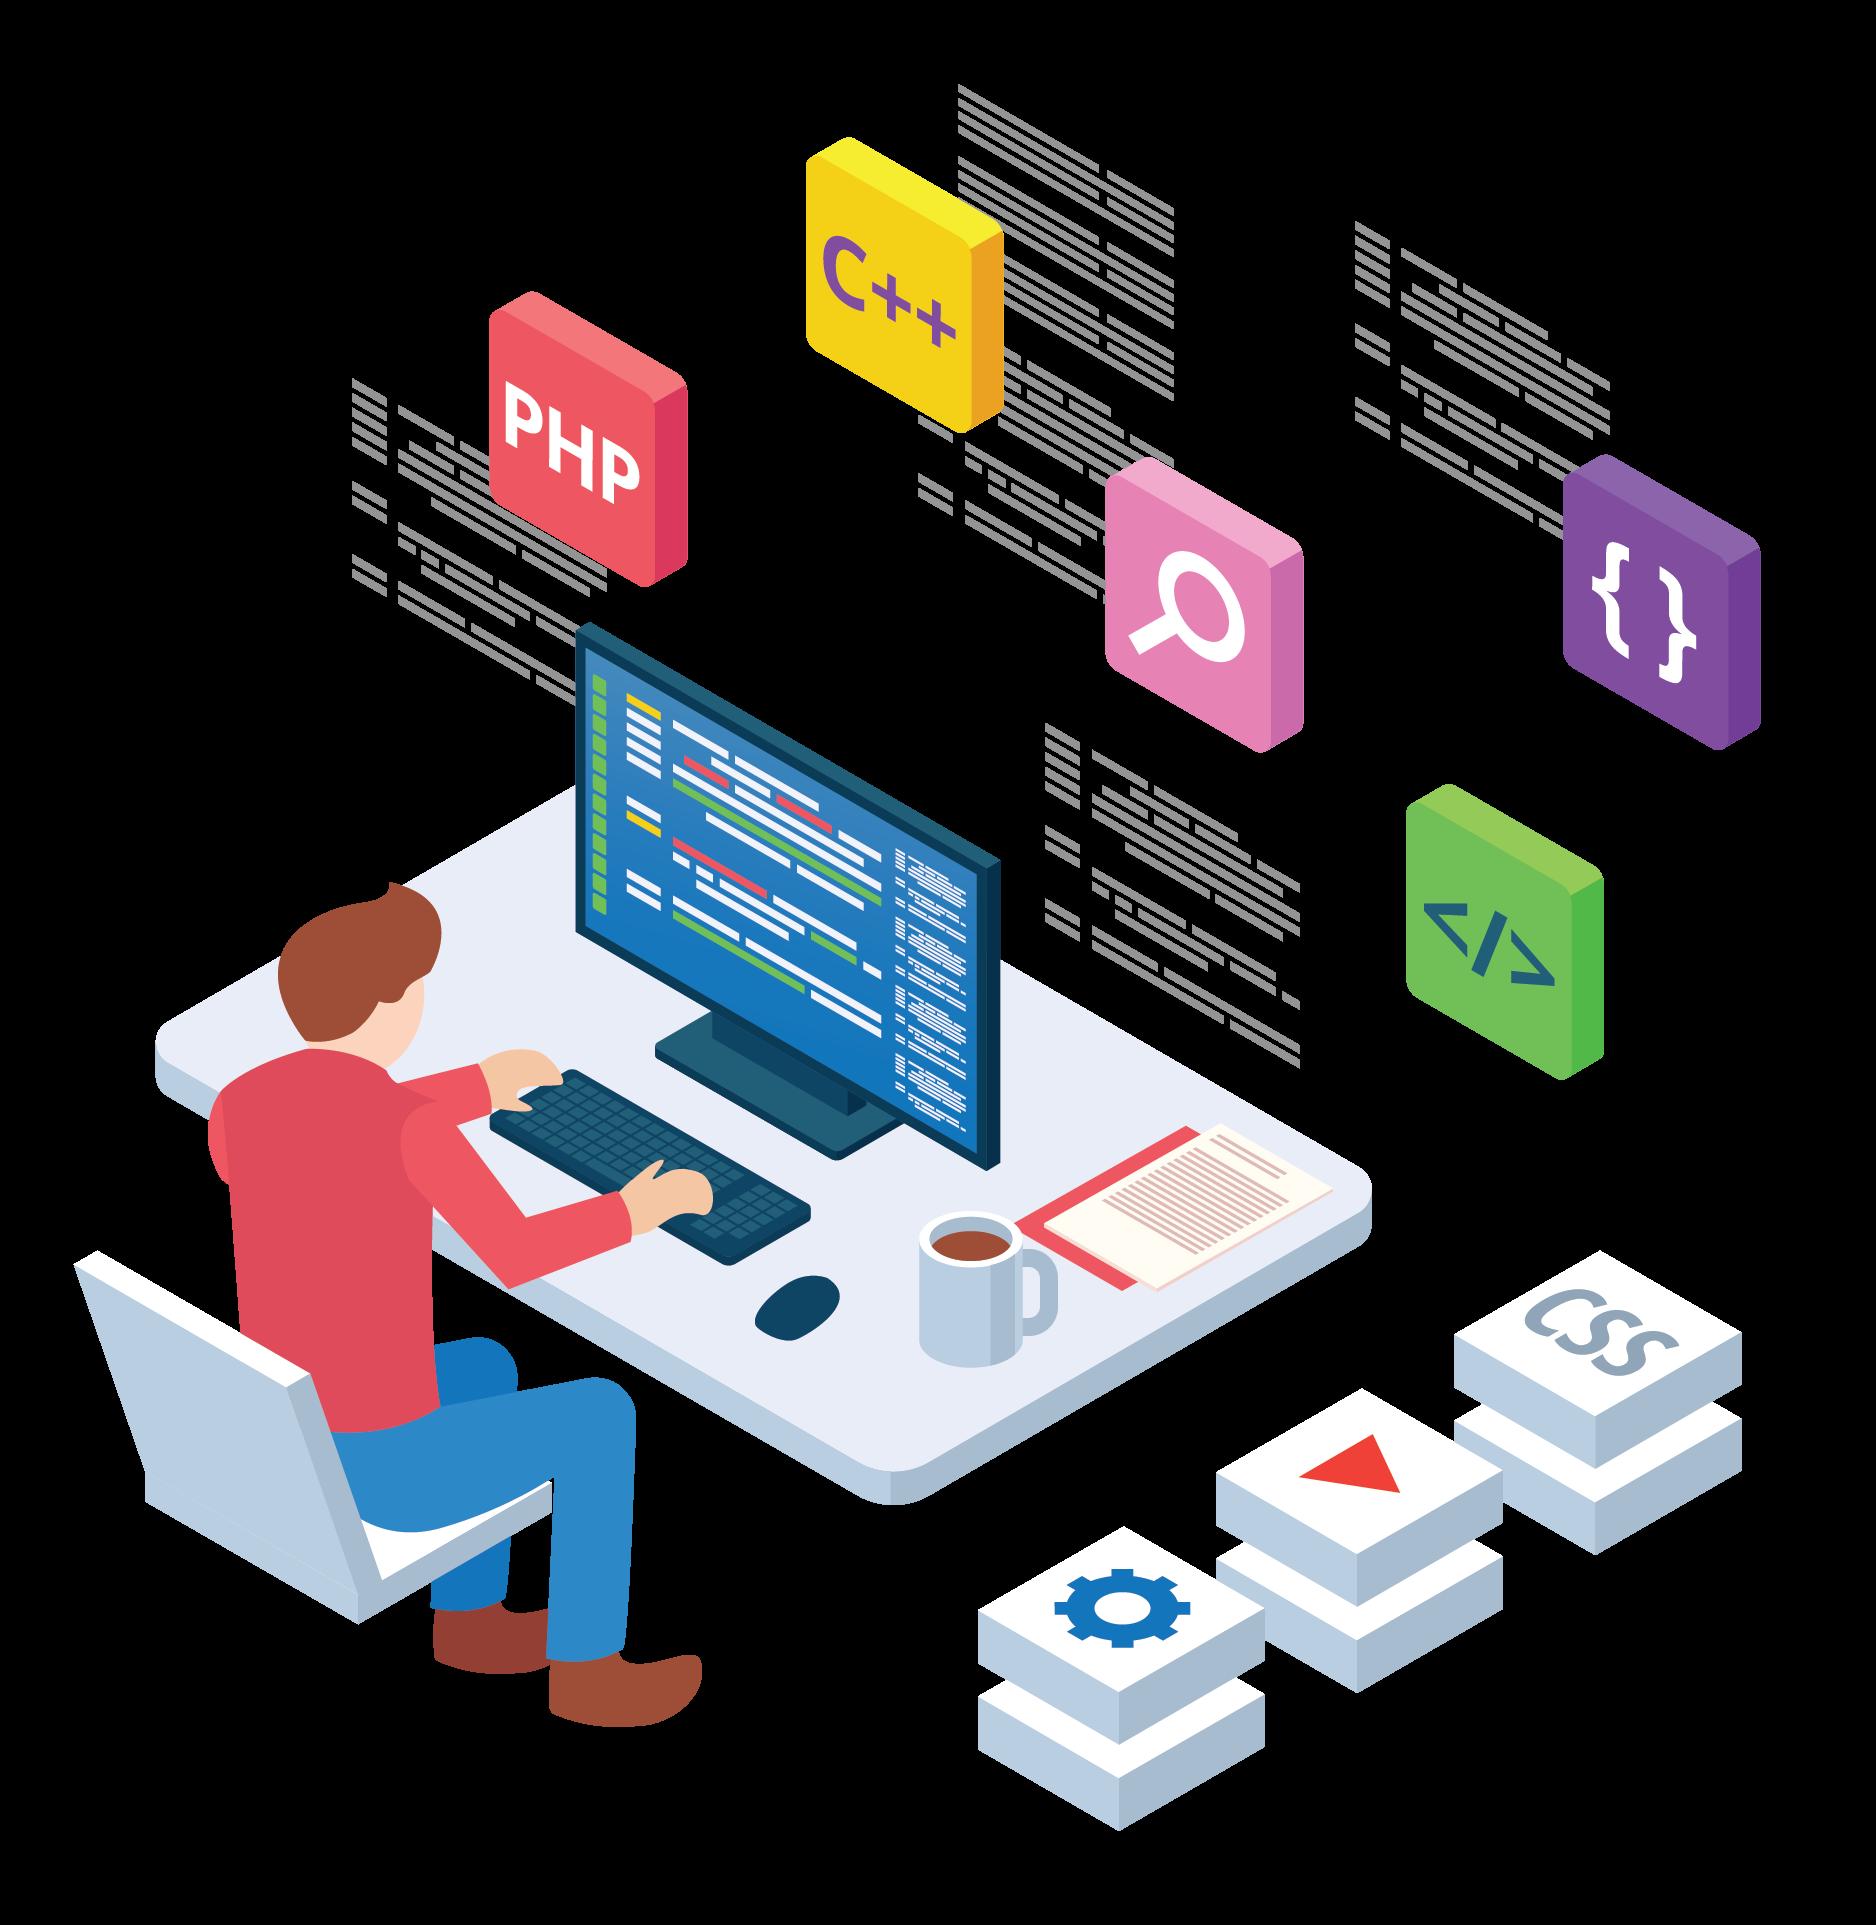 Custom PHP web development services